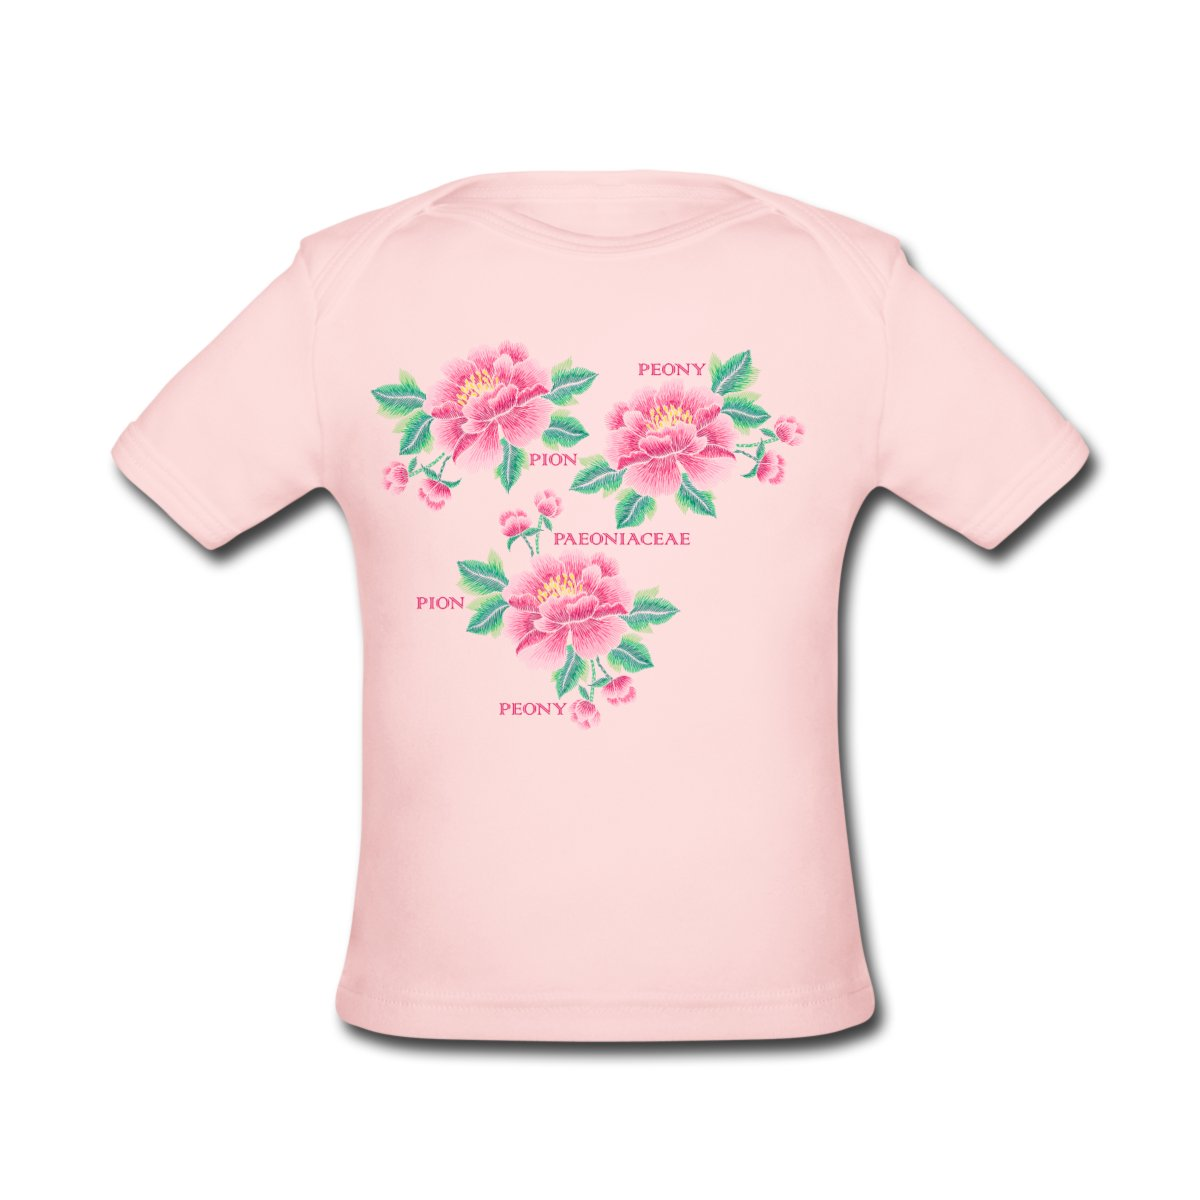 pion-ekologisk-kortaermad-baby-t-shirt.jpg